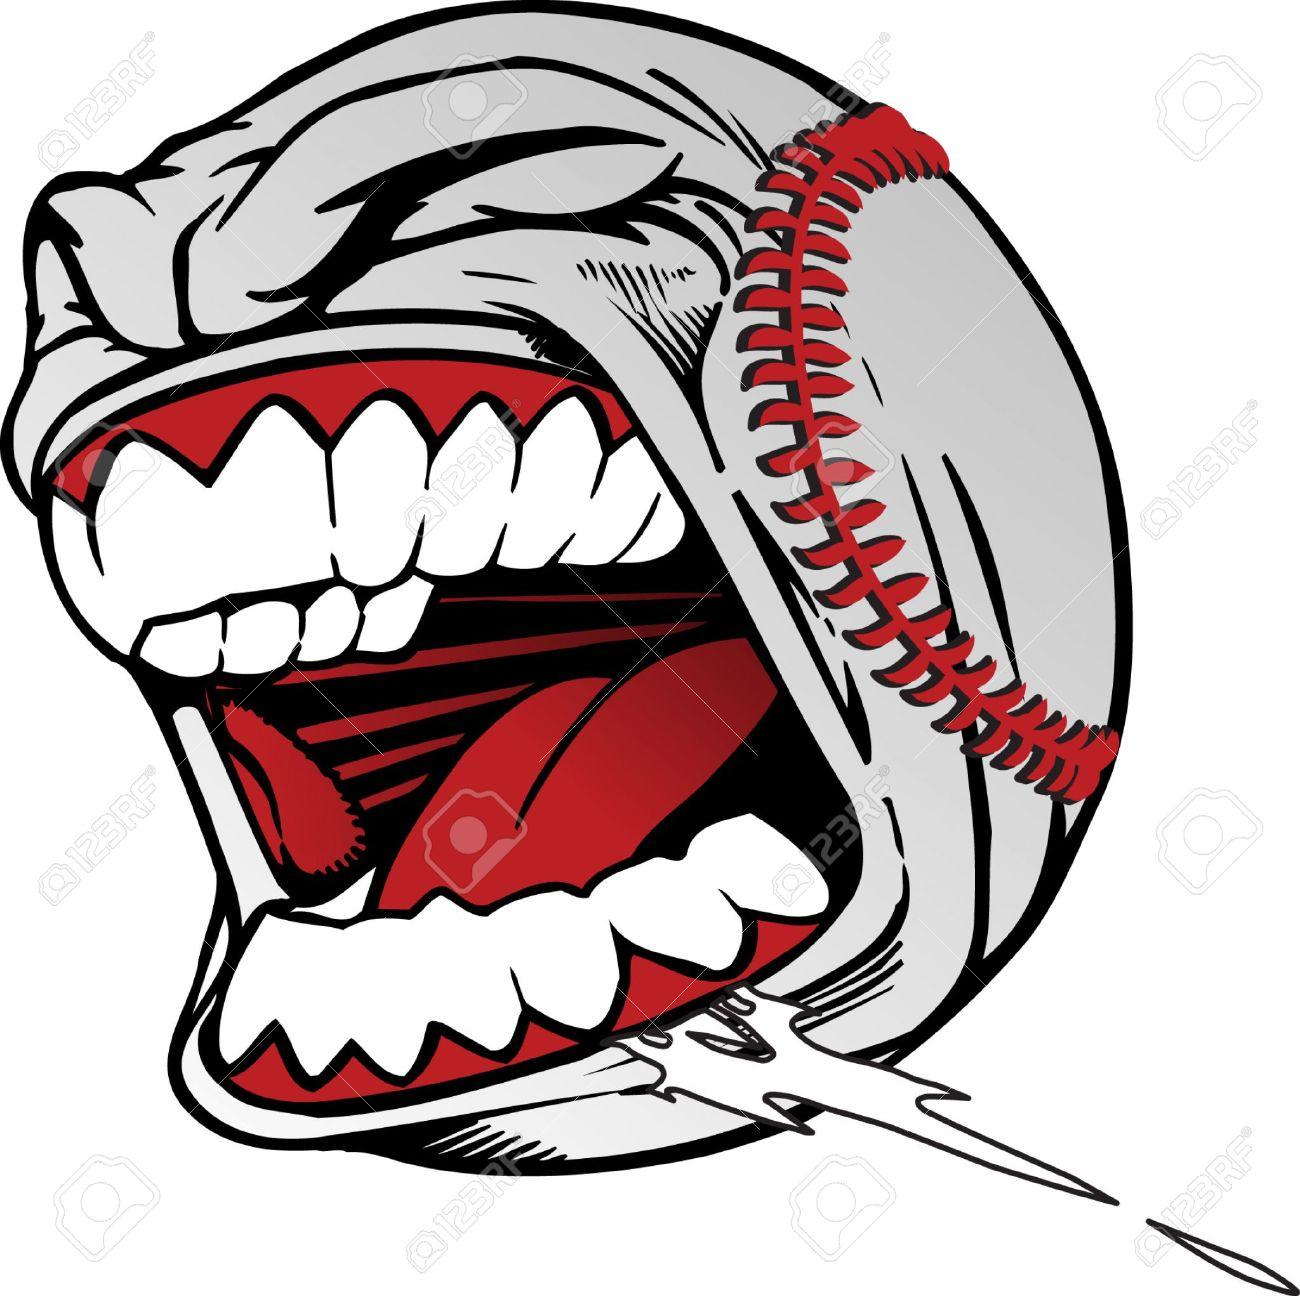 Screaming baseball clipart